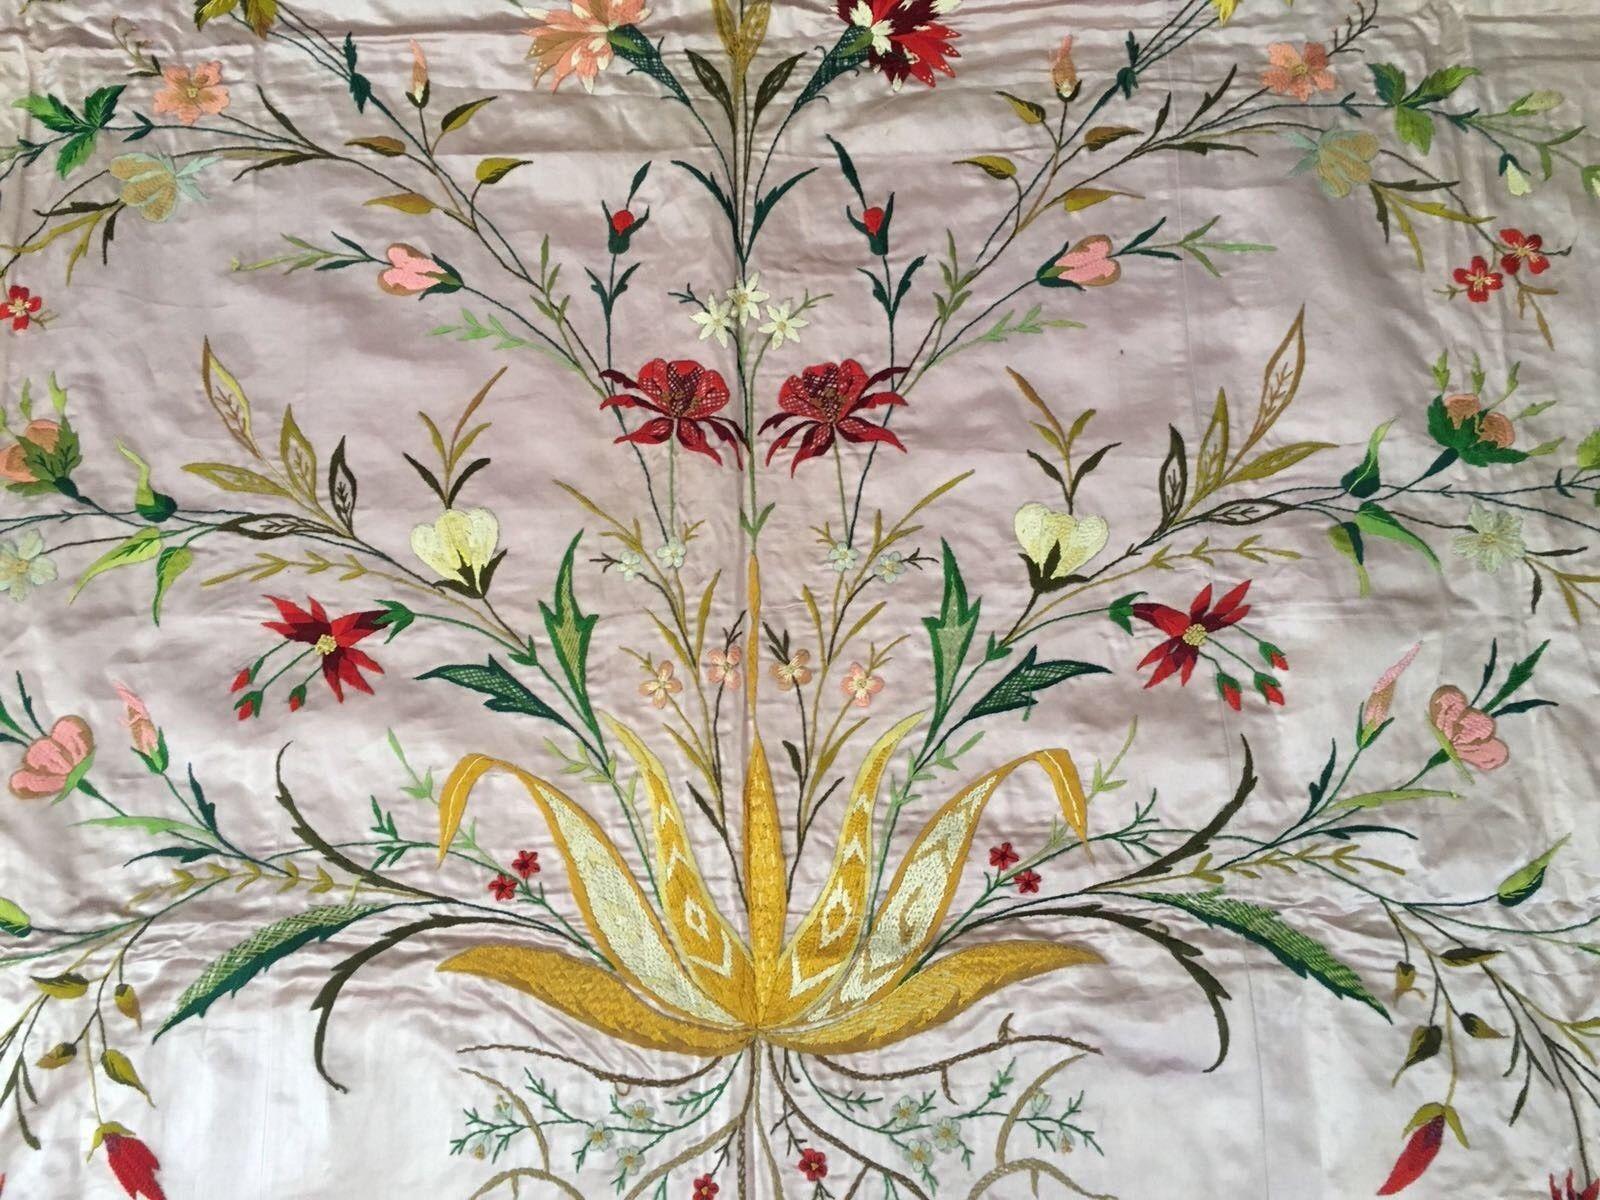 Huge Amazing Antique Armenian Silk Hand Embroidery On Silk Bed Cover 200cm Elde Nakis Kumas Nakis